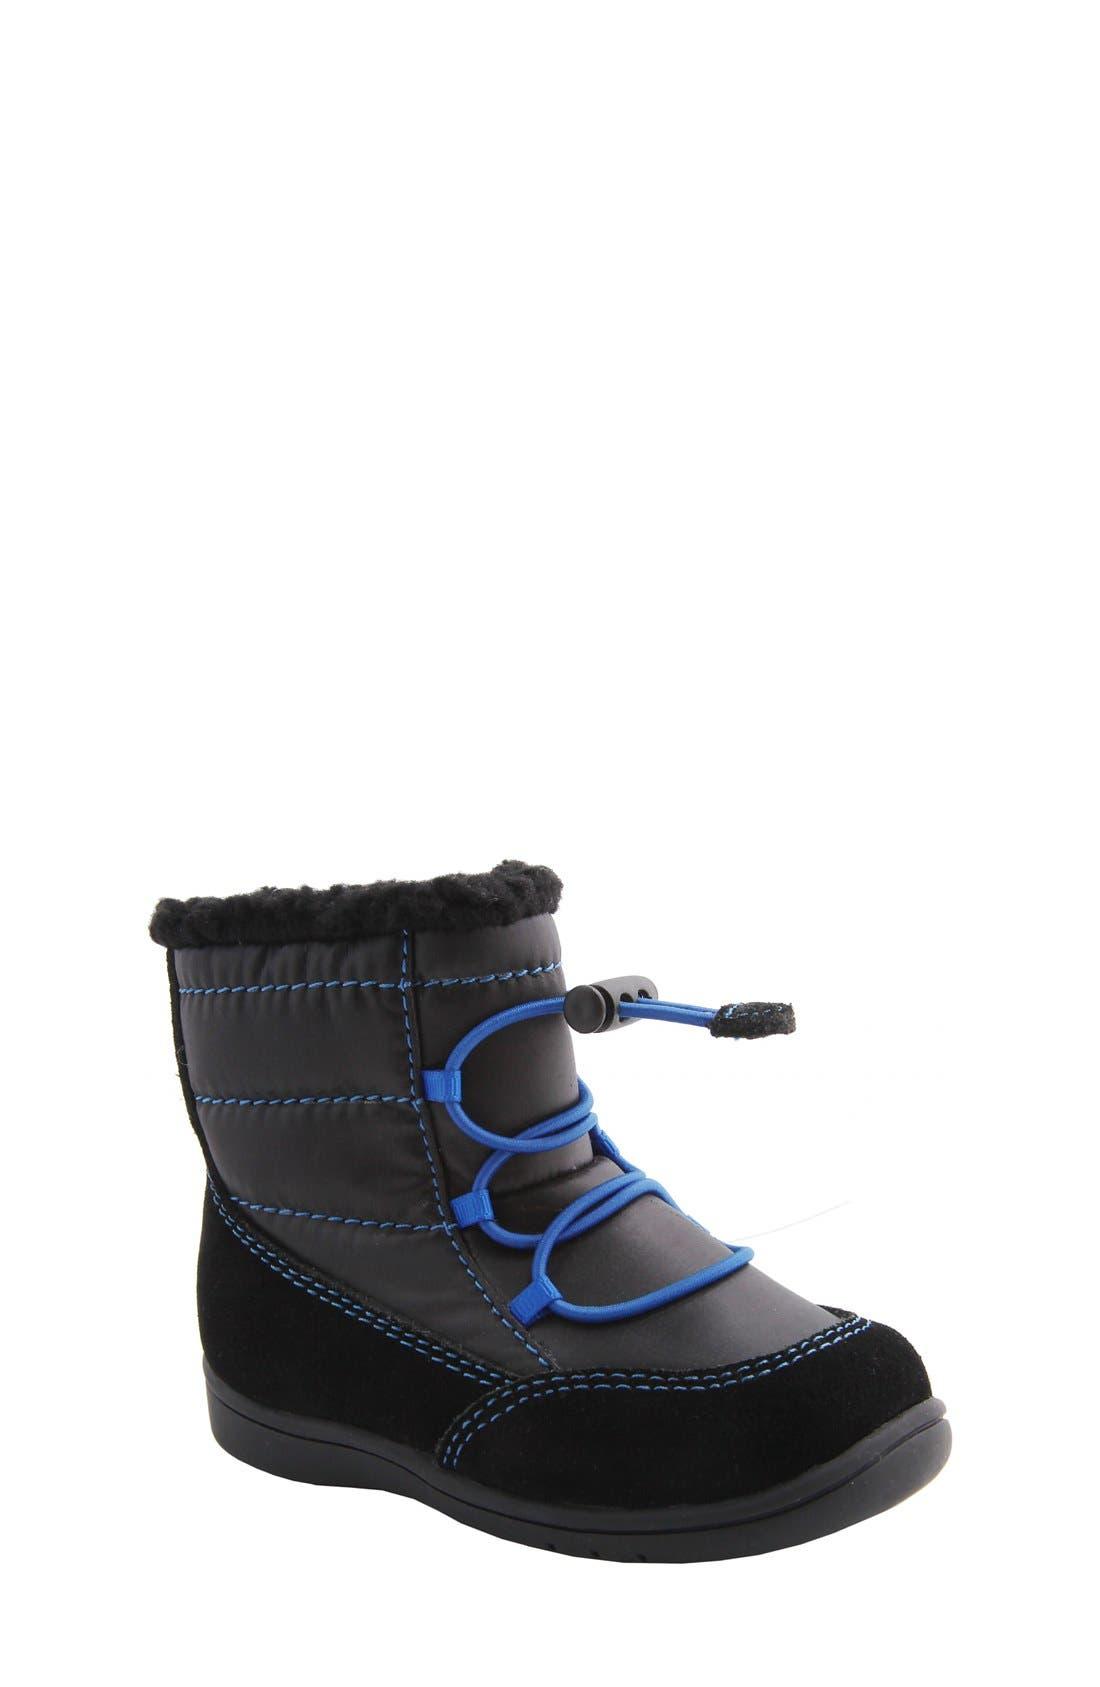 MOBILITY, Nina 'Yolie' Lace-Up Boot, Main thumbnail 1, color, BLACK